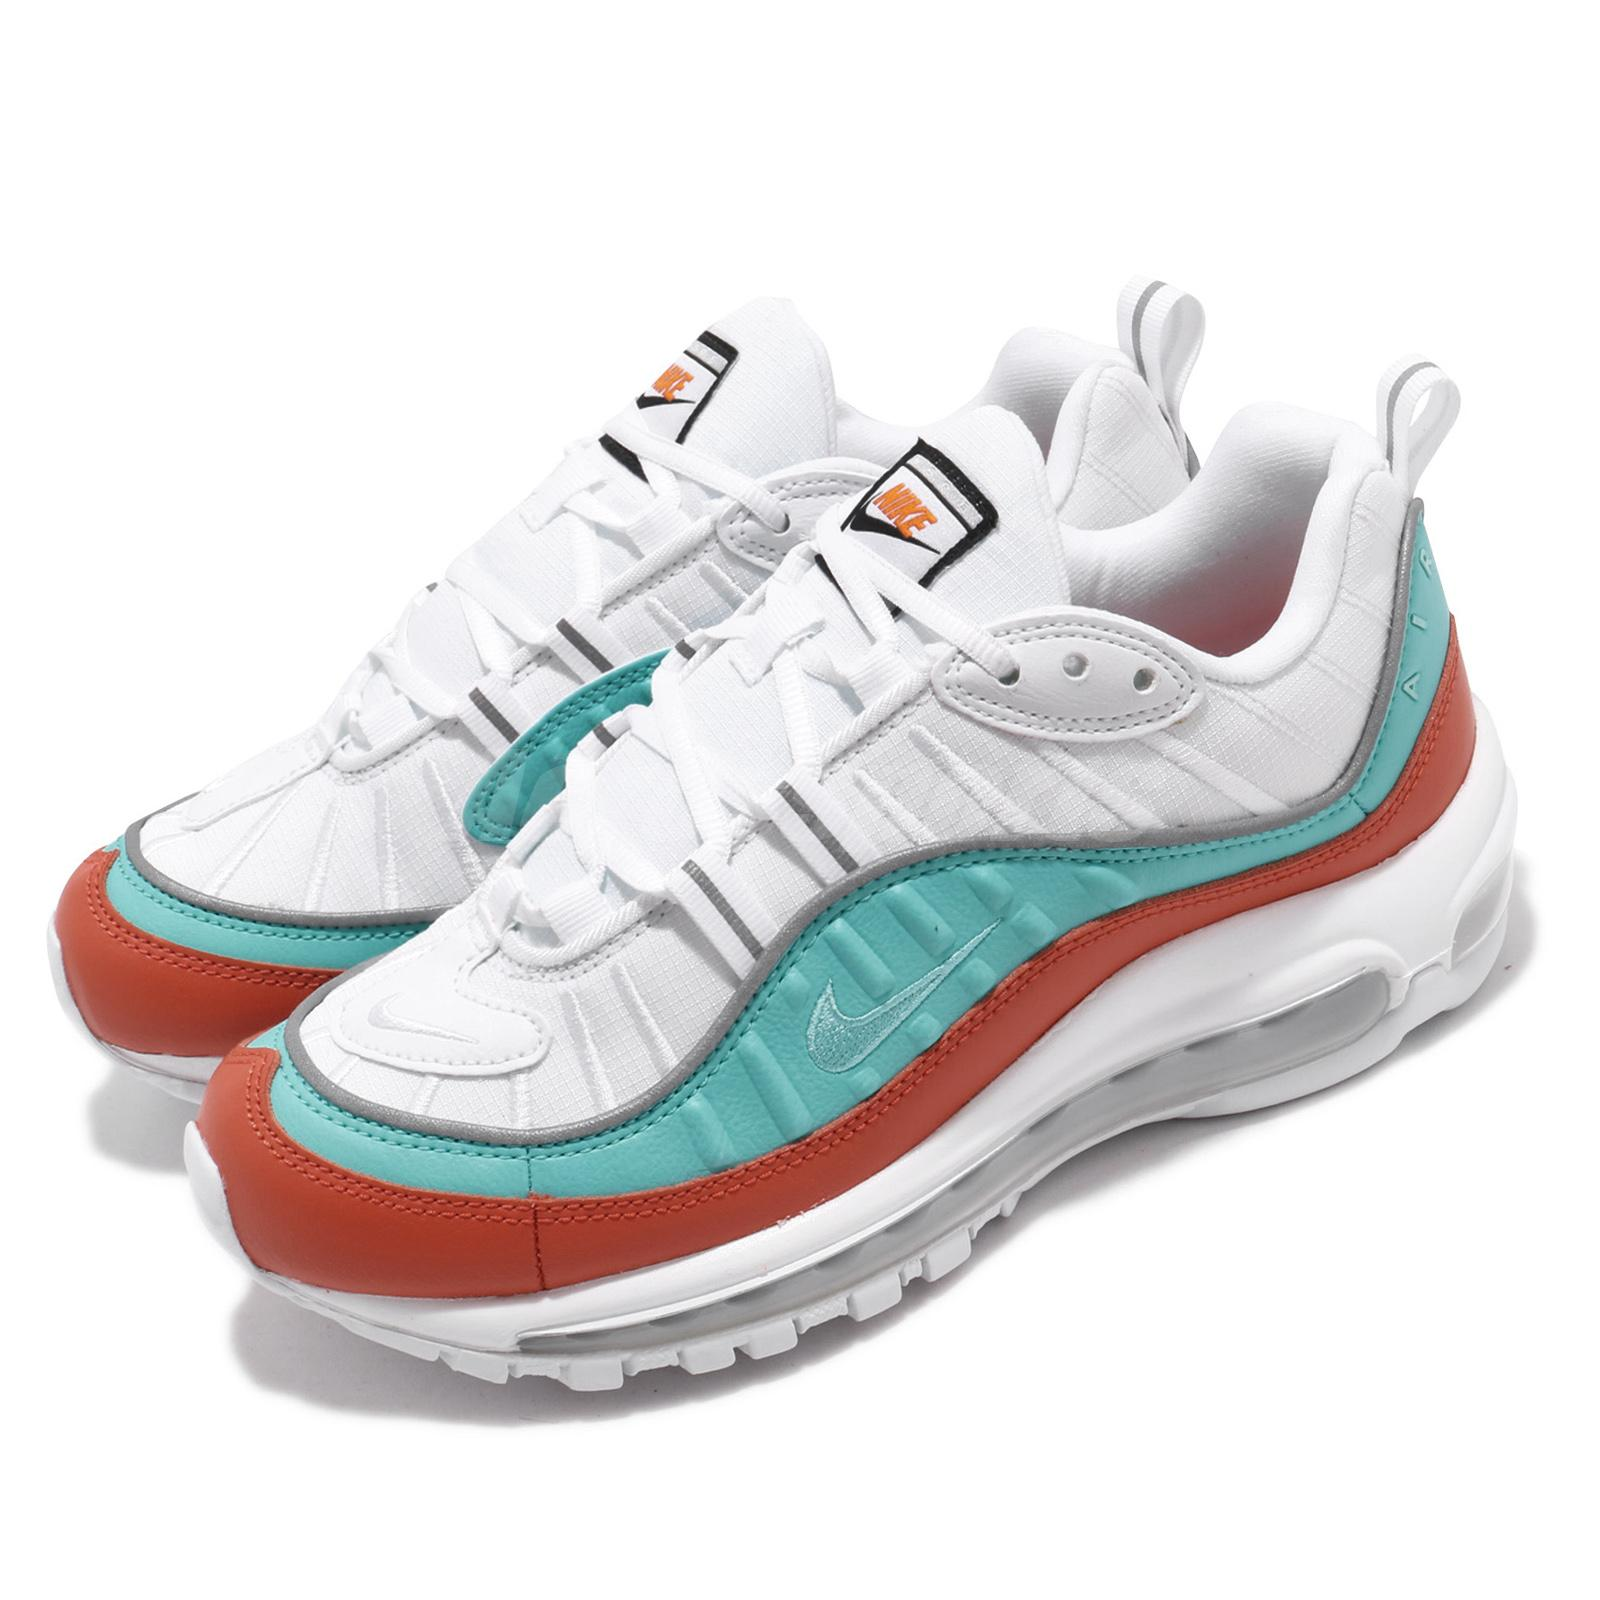 Air Max 98 Se Sneaker in Cosmic Clay Light Aqua White